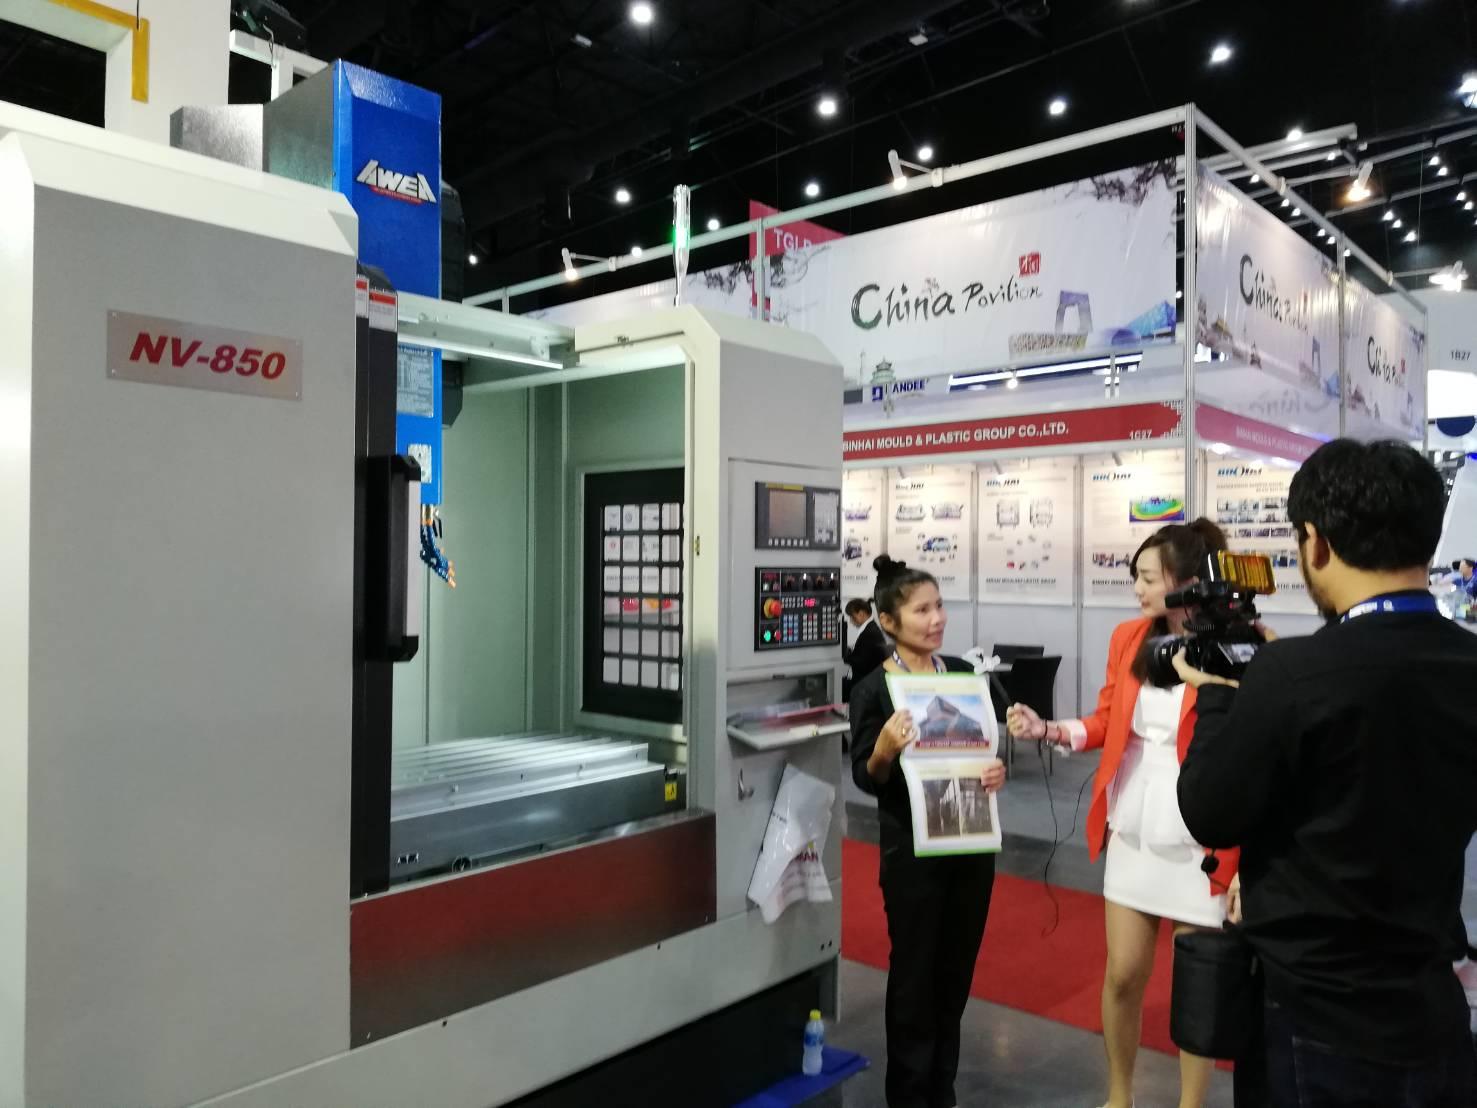 InterMold Thailand 2018 – บริษัท ฟุกุซาน จำกัด เป็นตัวแทนจำหน่าย